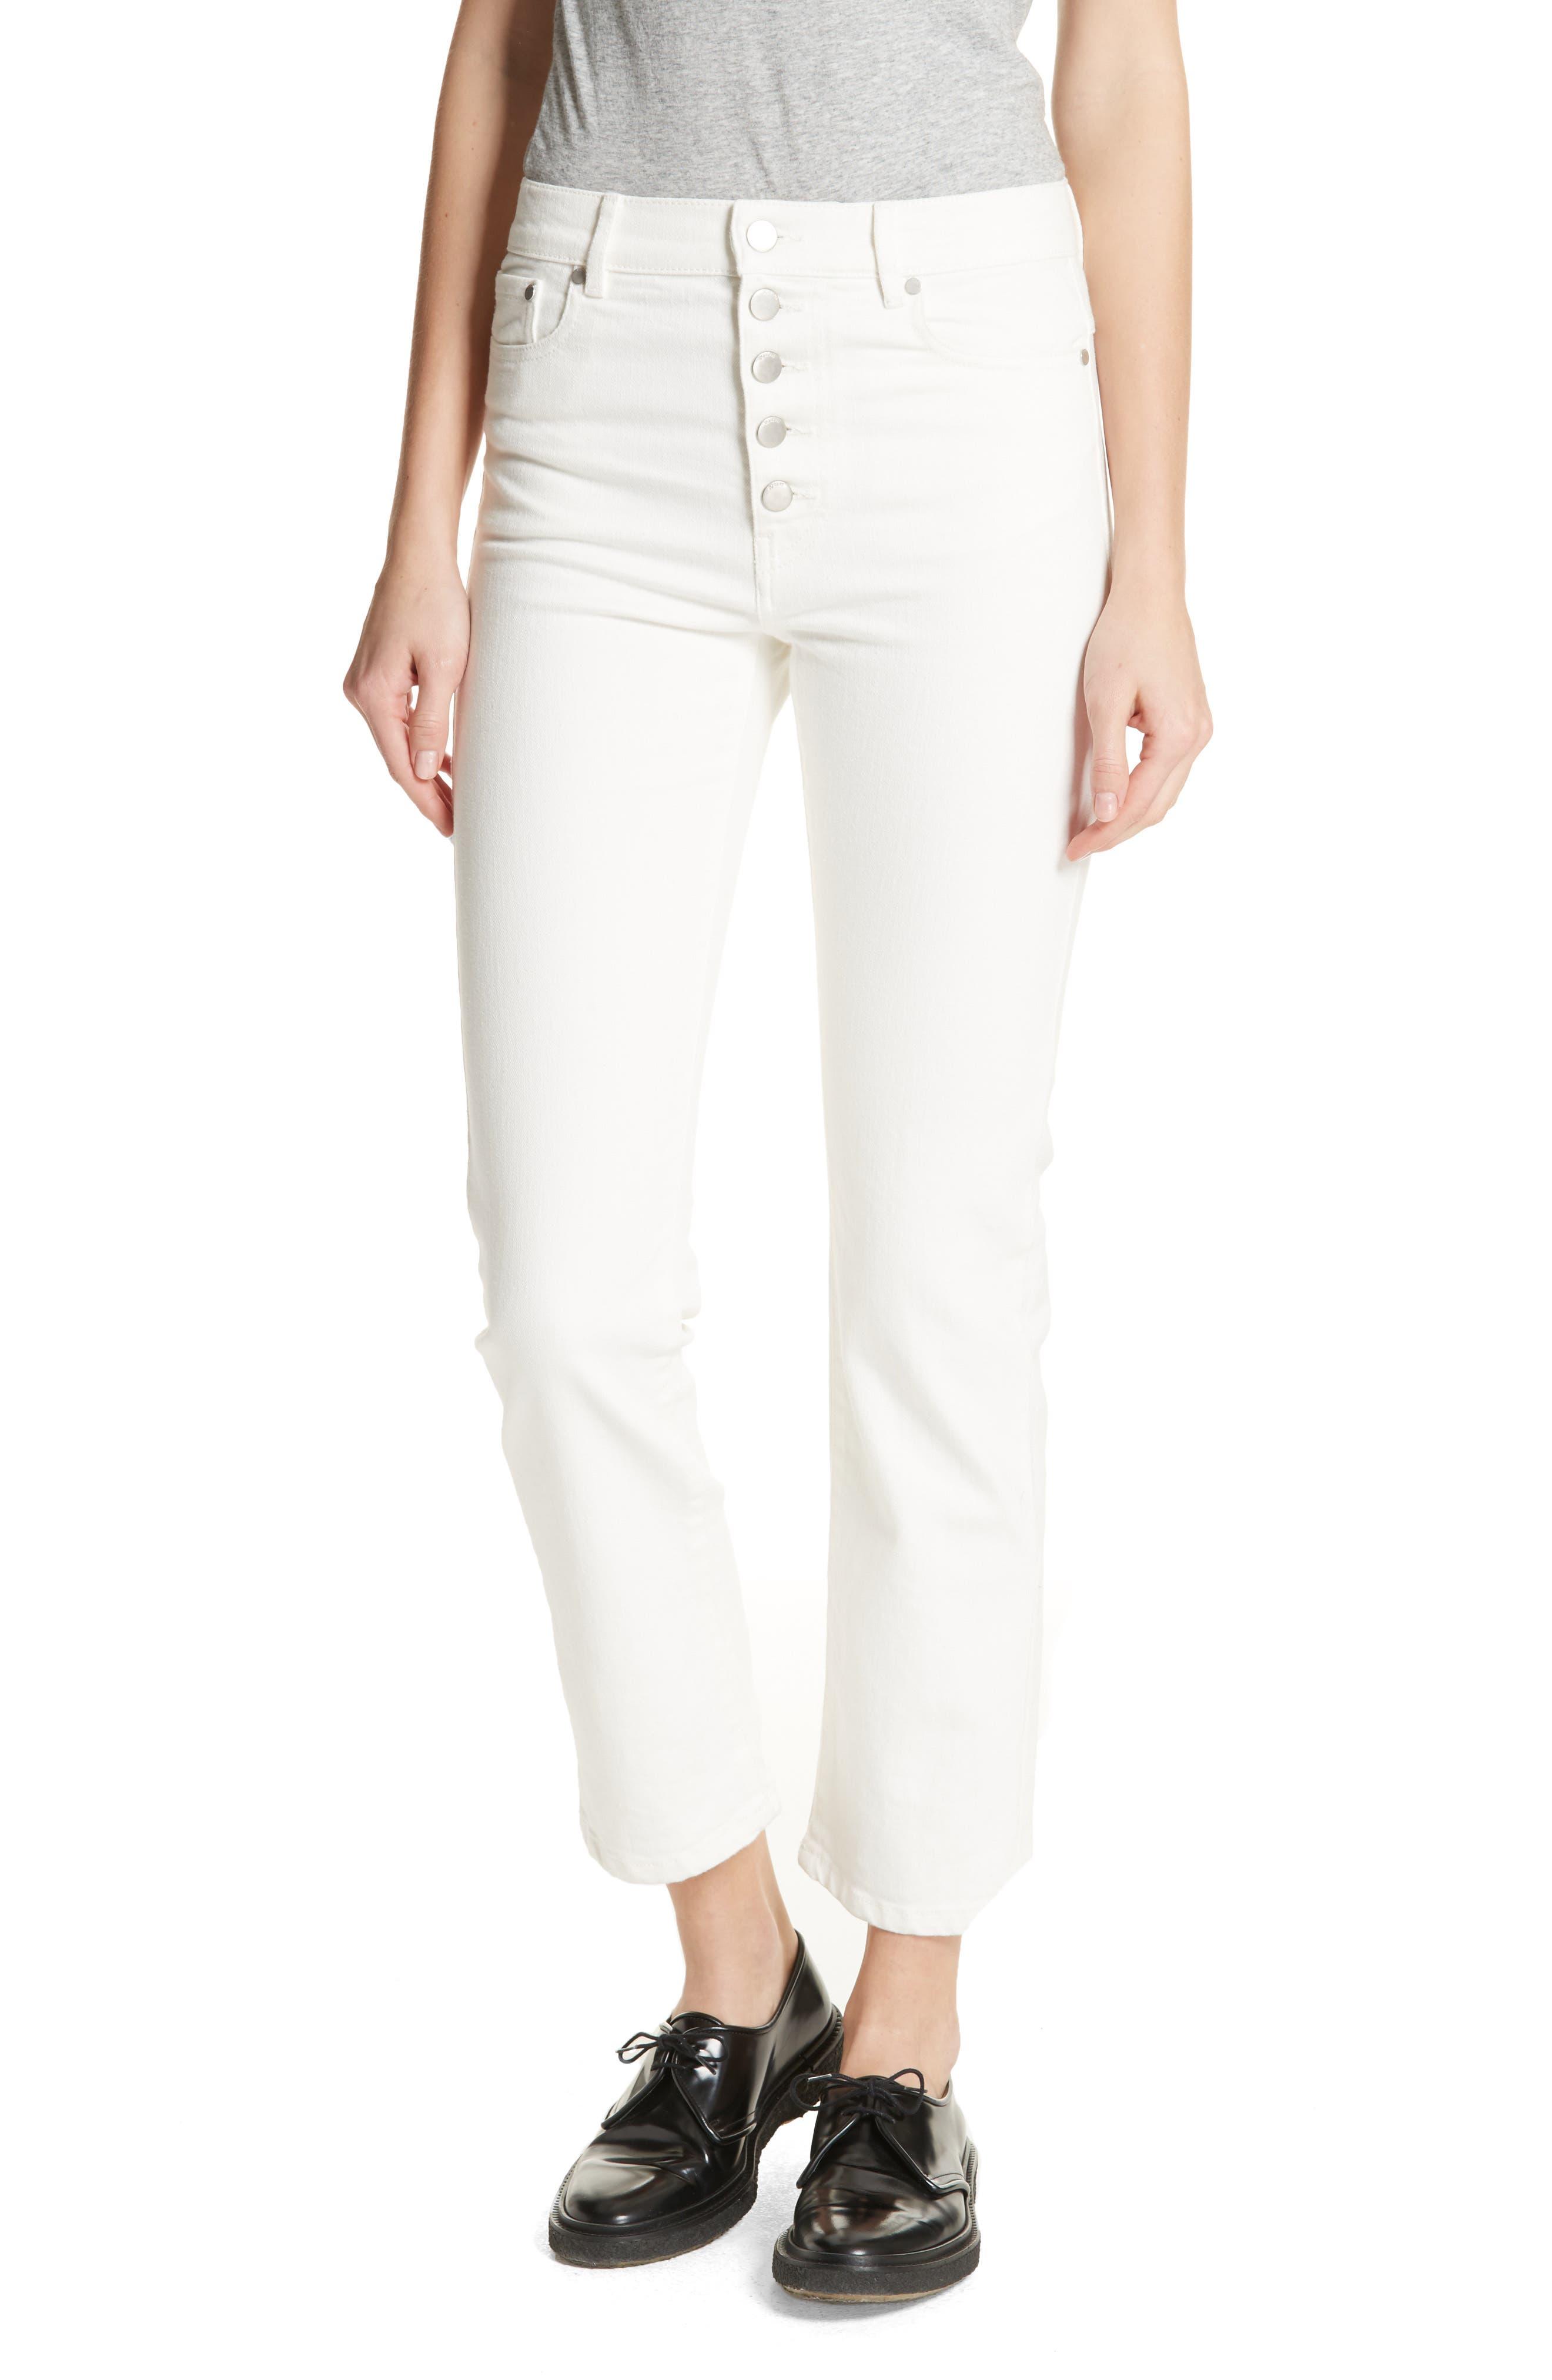 JOSEPH White Denim Jeans